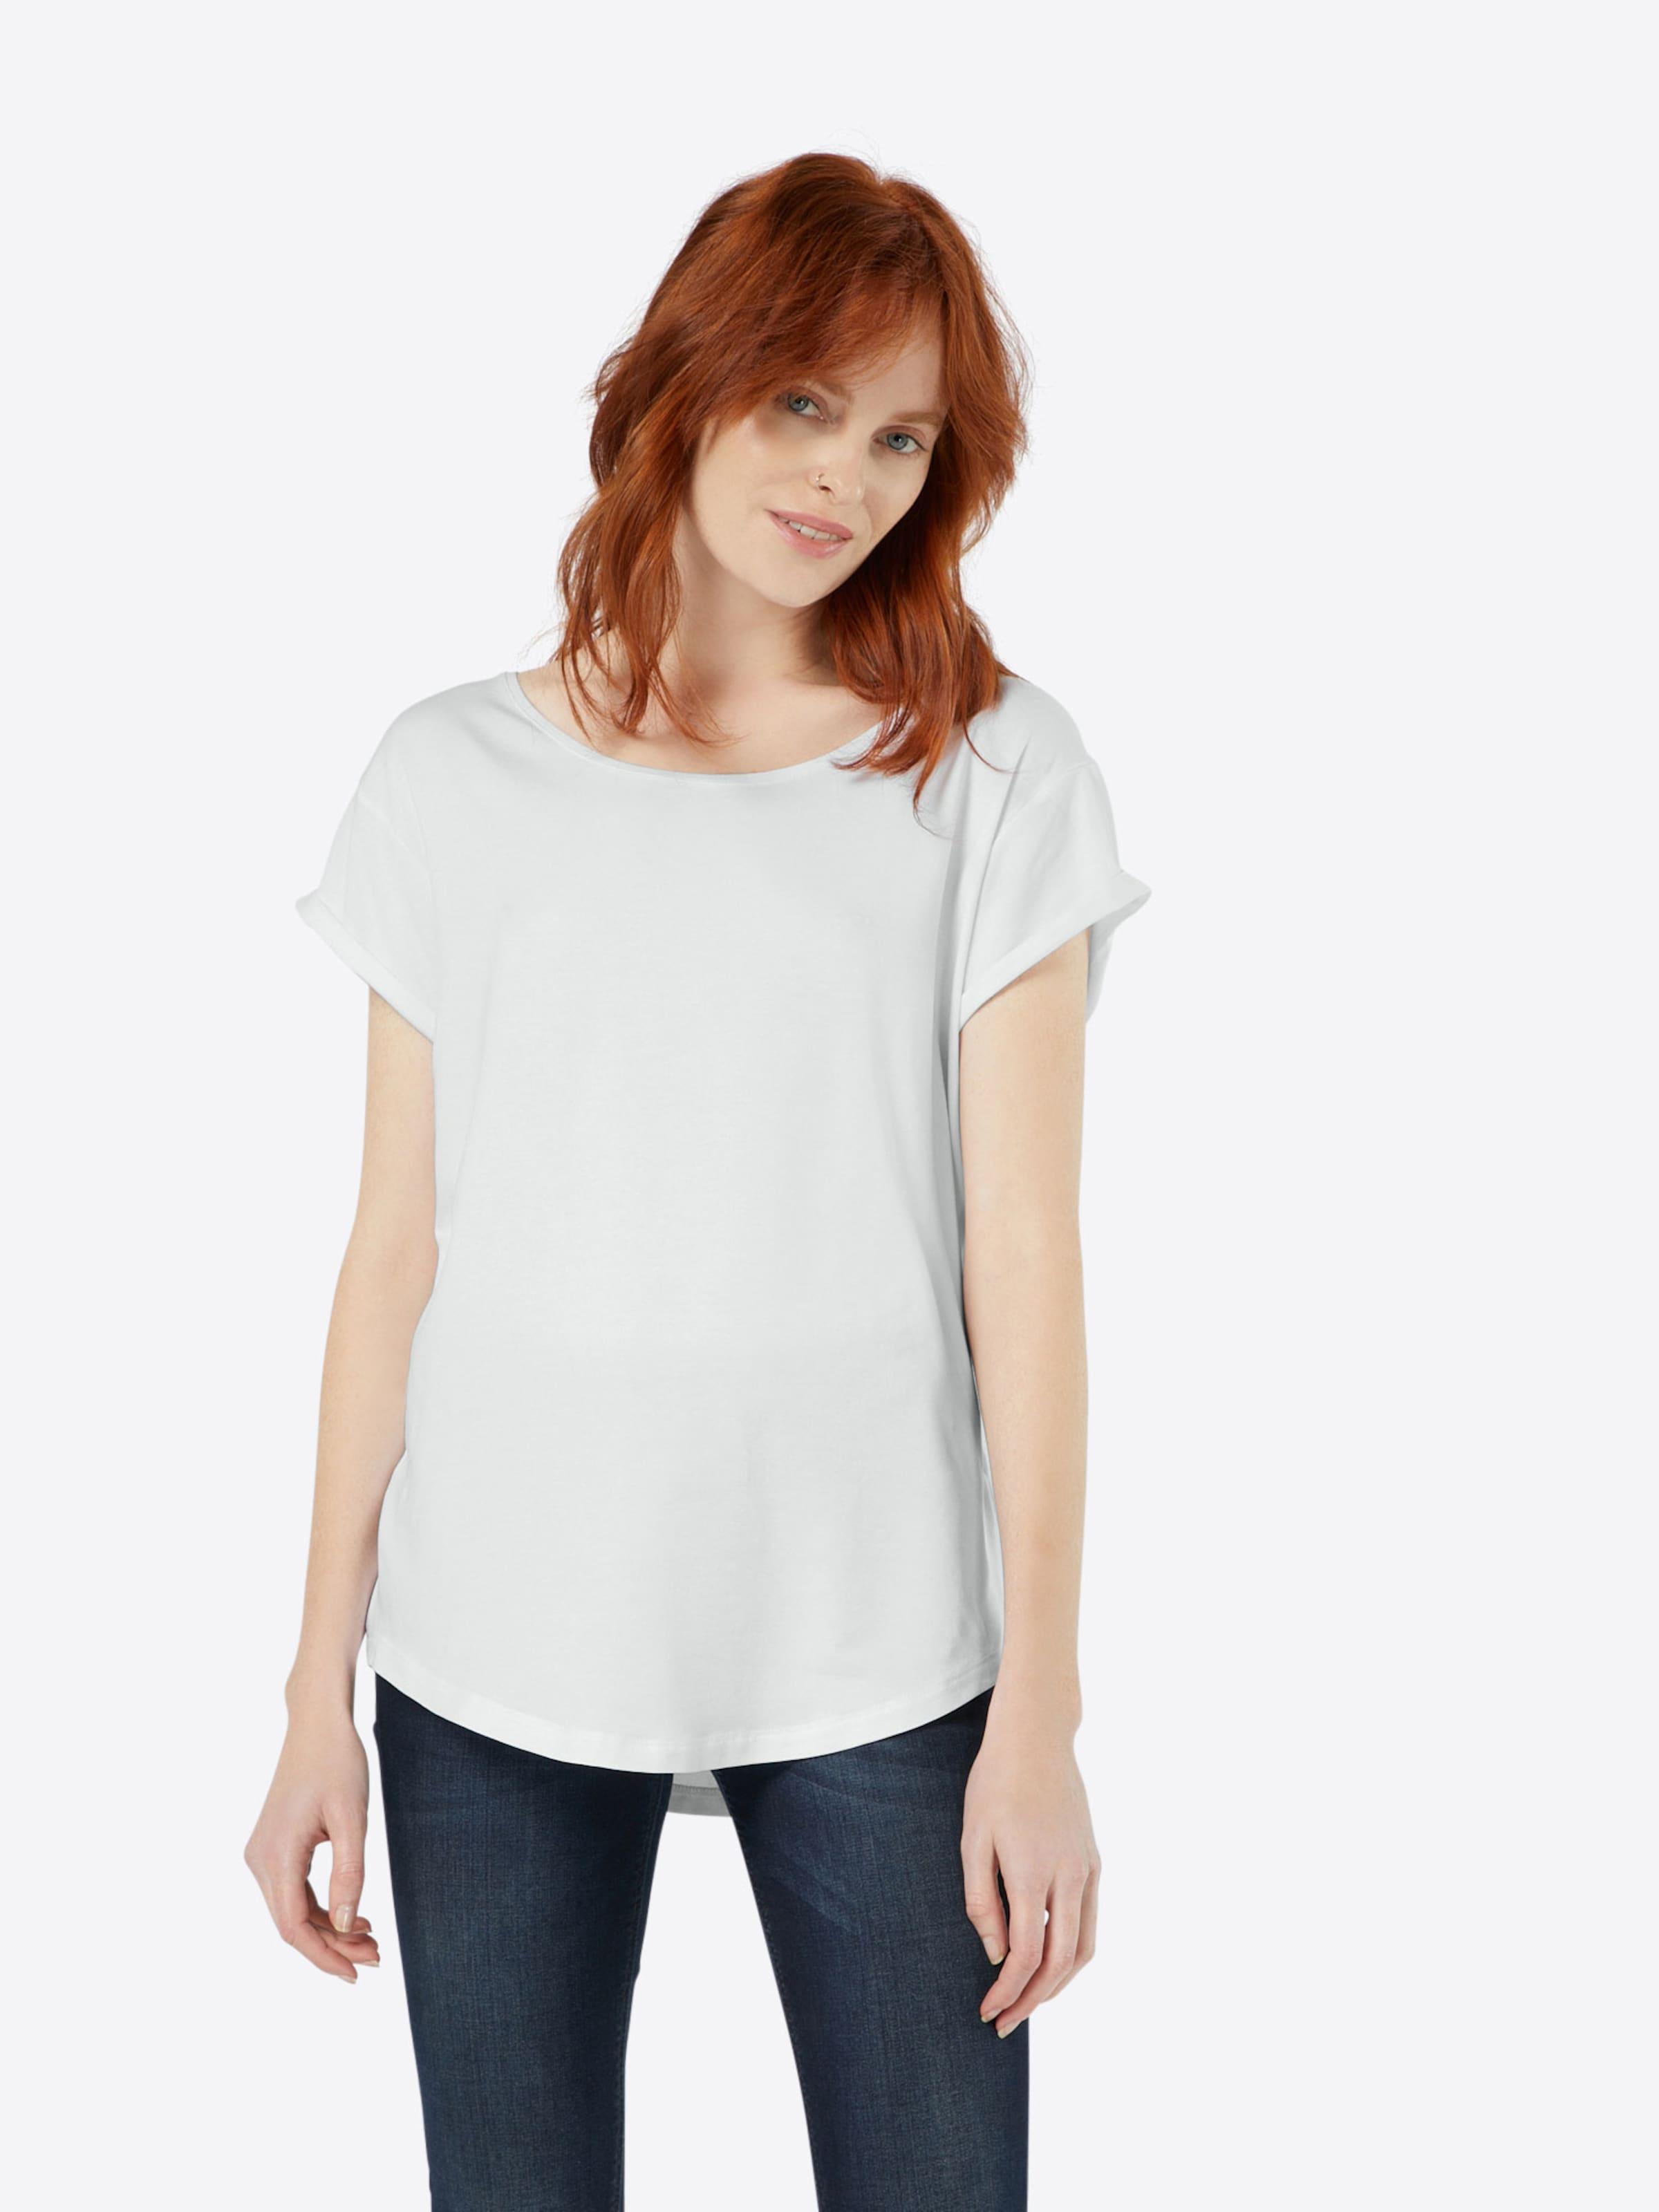 mbym Basic-Shirt 'Nisha' Niedrigster Preis Günstig Online DbY5vs